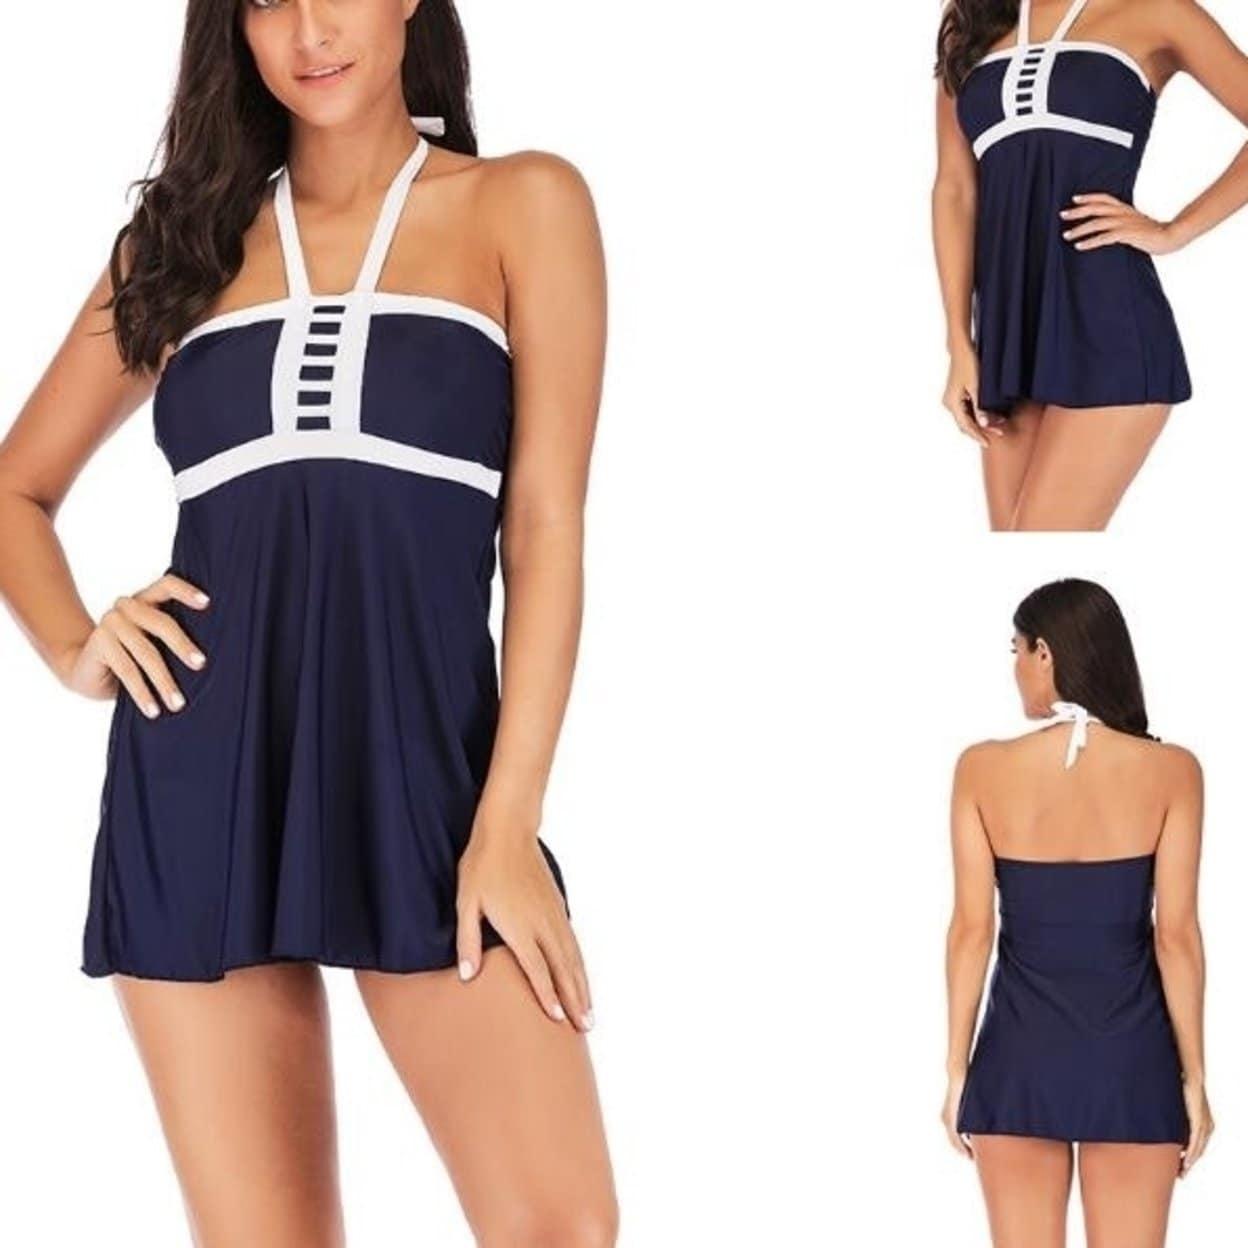 Womens One Piece Plus Size Swimming Bathing Suits Swimdress Halter Swimwear  Tummy Control Skirt Swimsuit